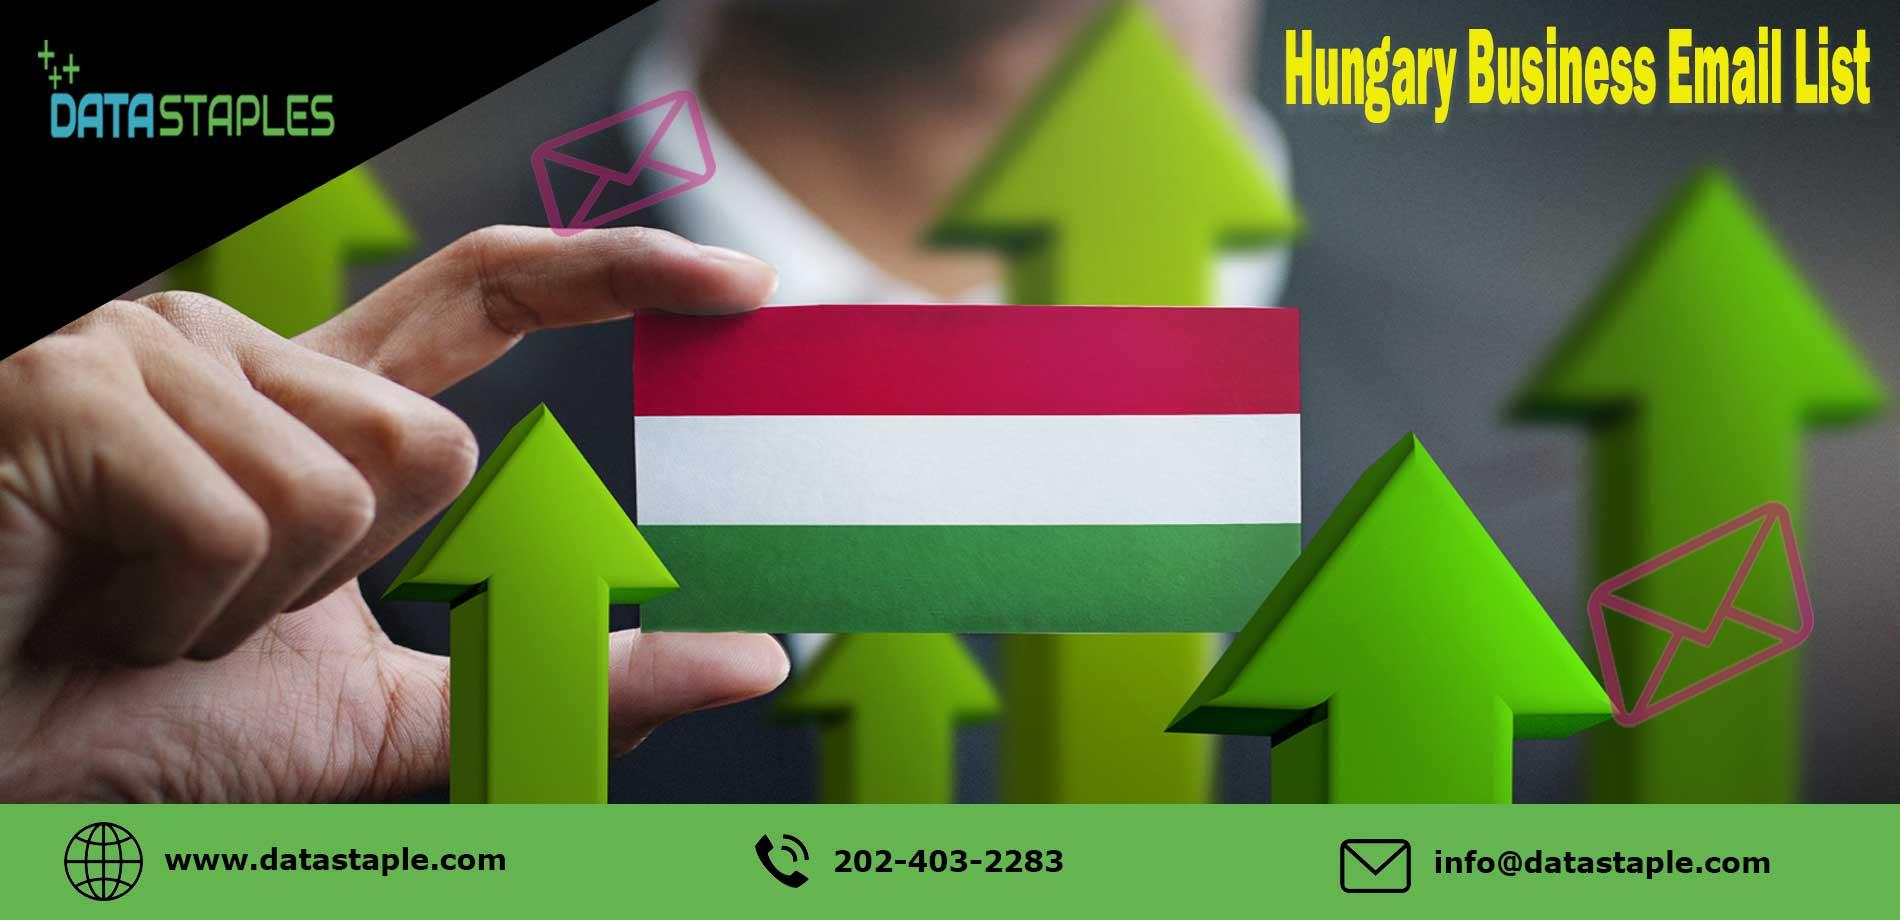 Hungary Business Email List   DataStaples